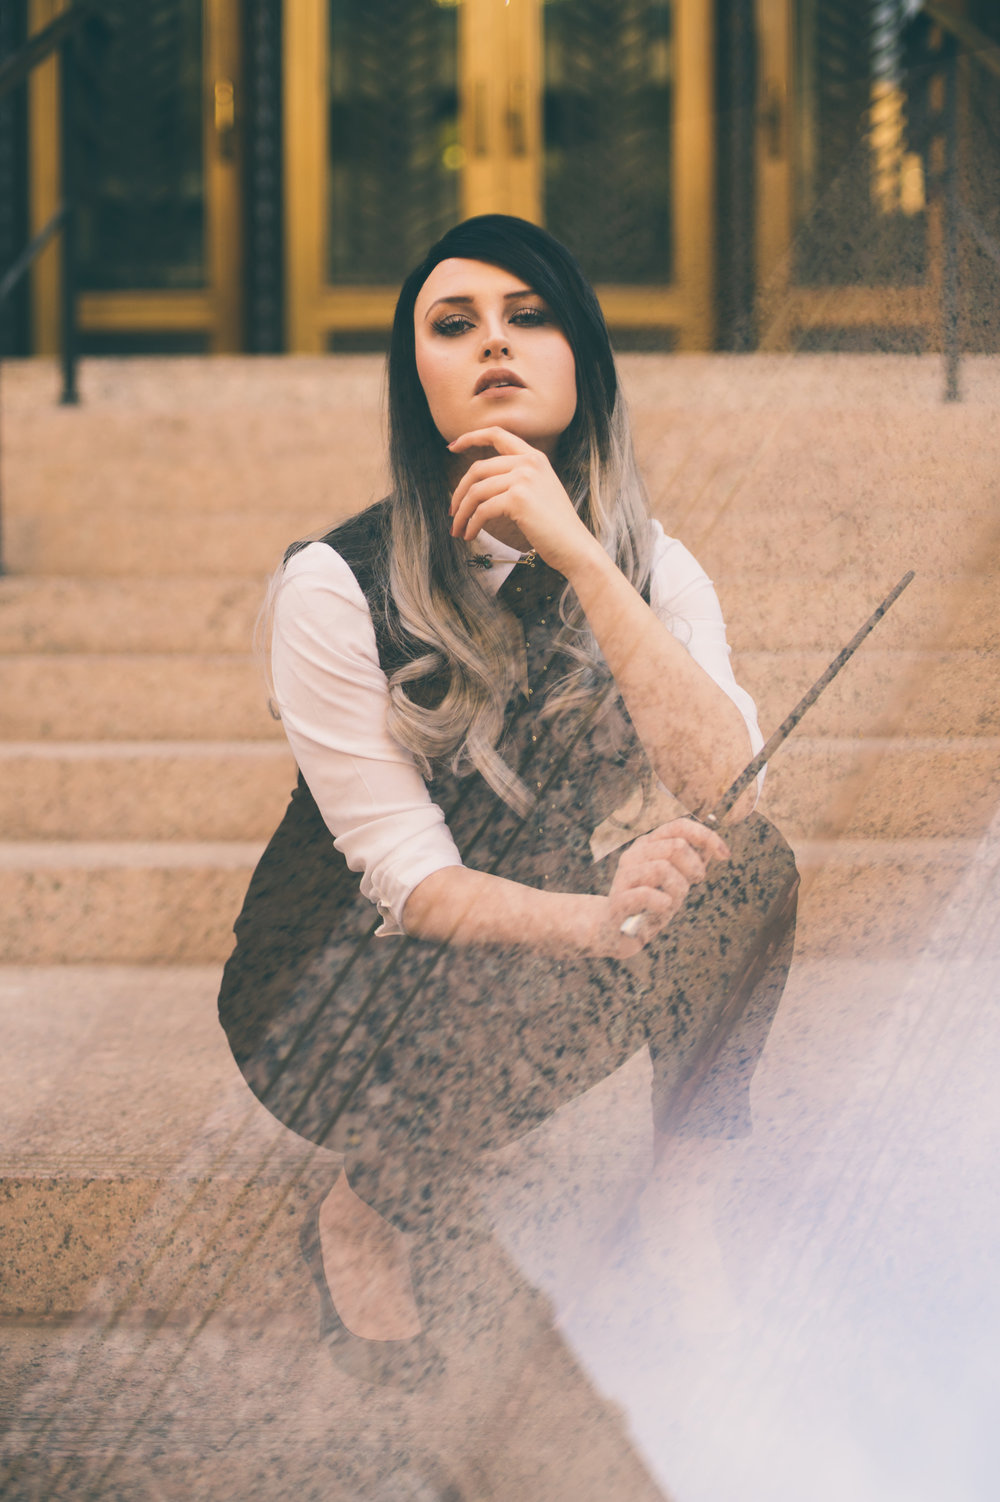 Katya_PercivalGraves-5.jpg